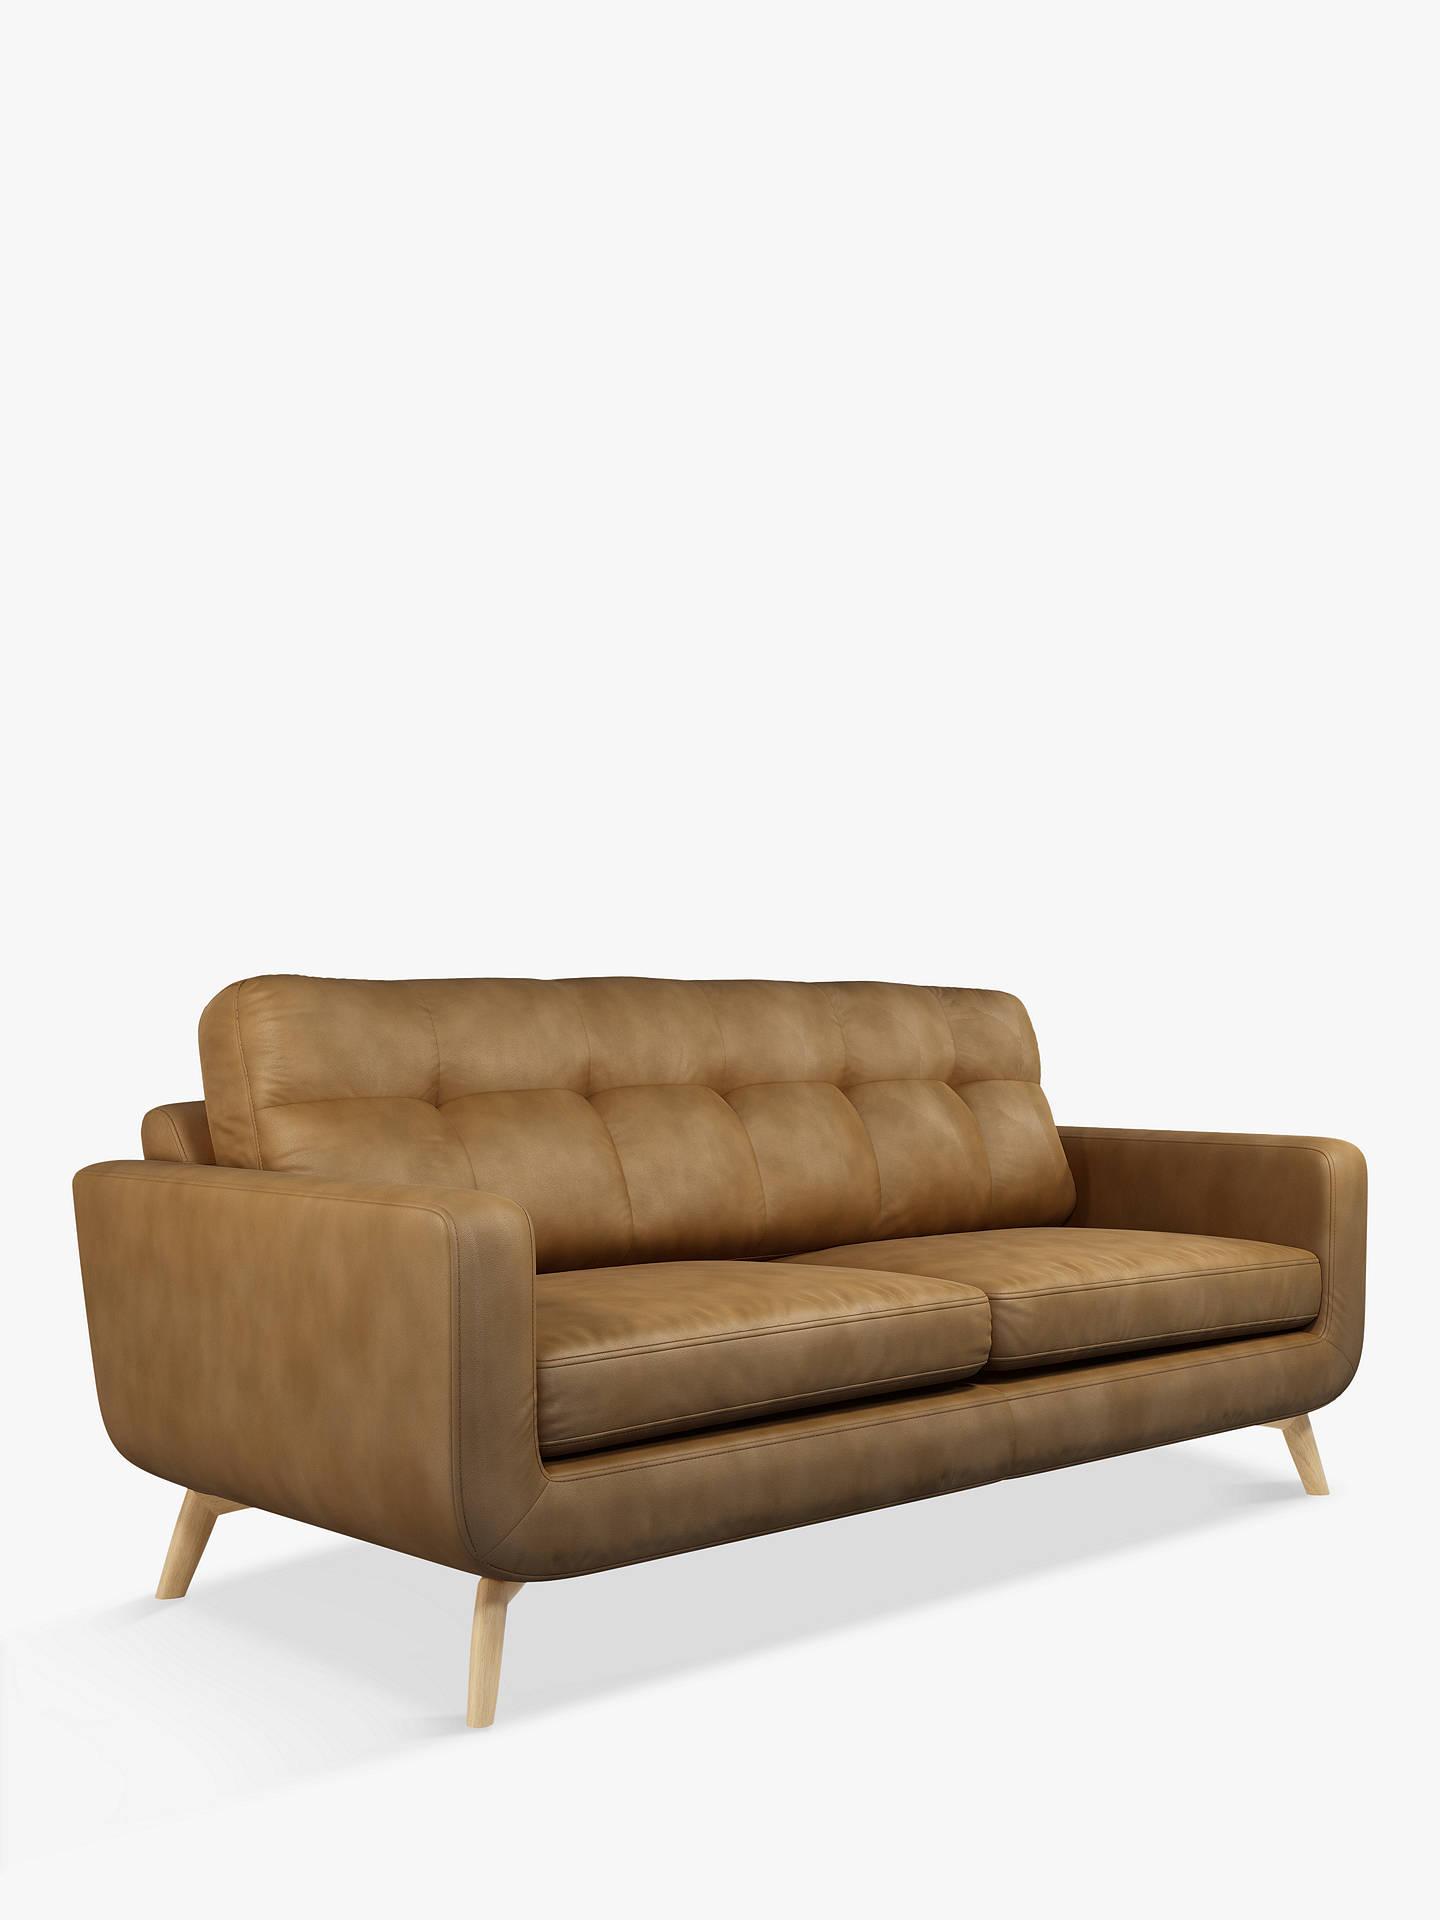 John Lewis & Partners Barbican Large 3 Seater Leather Sofa, Light Leg,  Demetra Light Tan